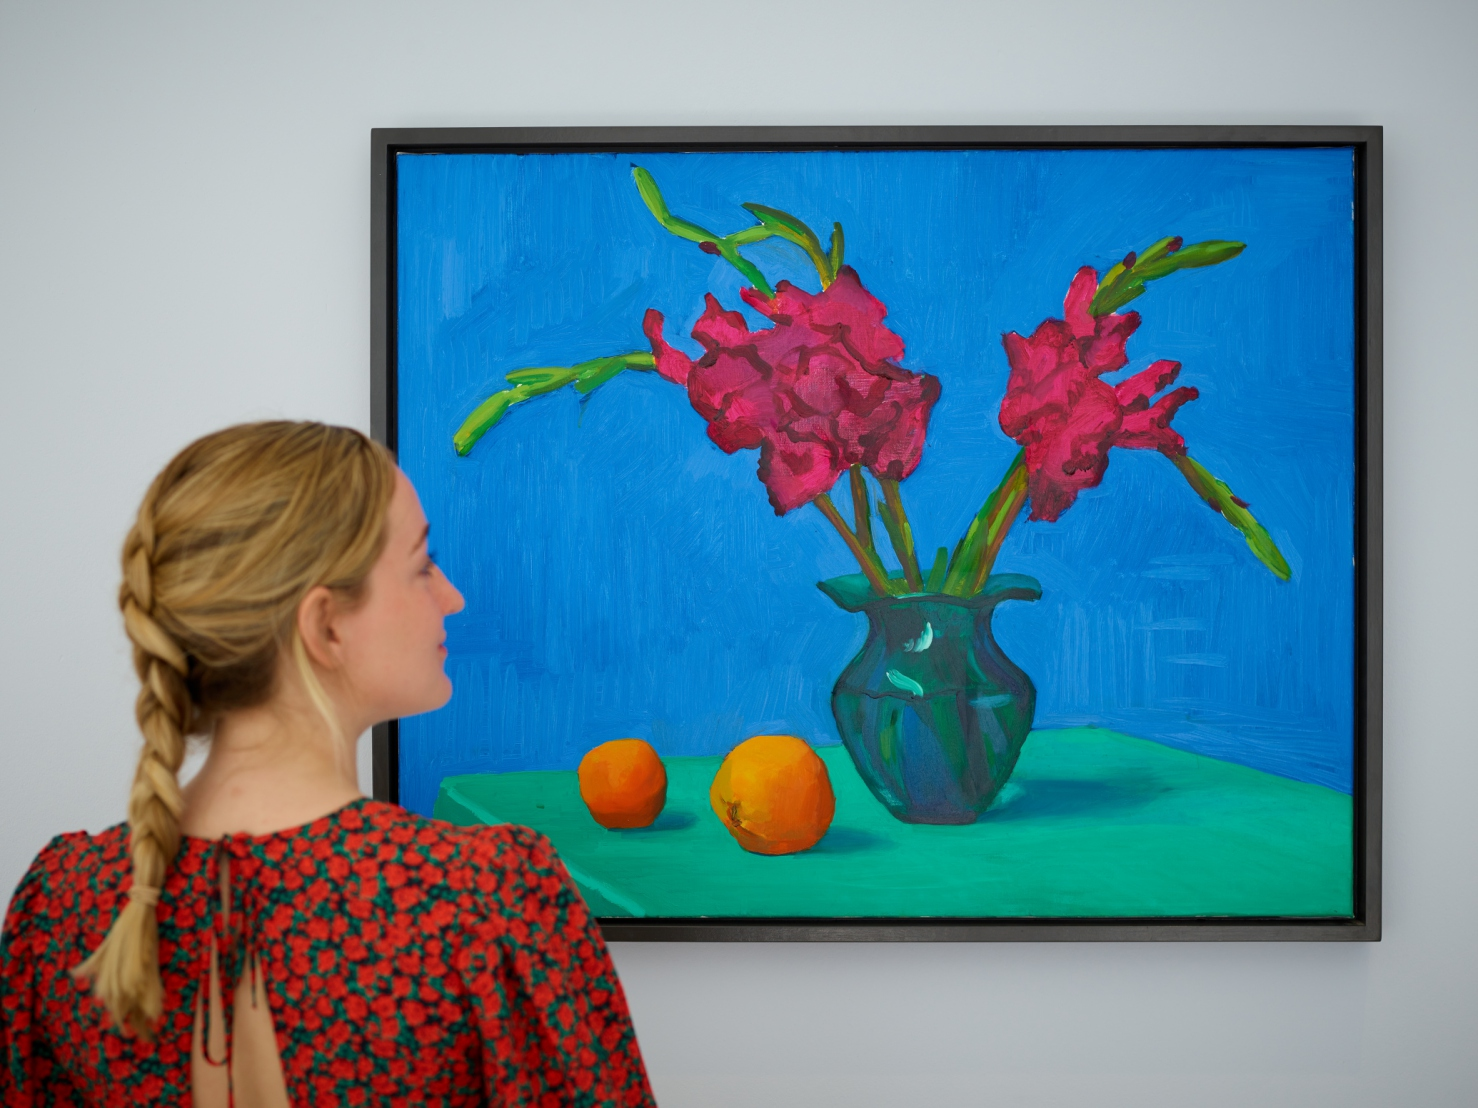 Lot 4- David Hockney, Gladioli with Two Oranges, 1996, est_ 1,500,000- 2,000,000 in situ.jpg